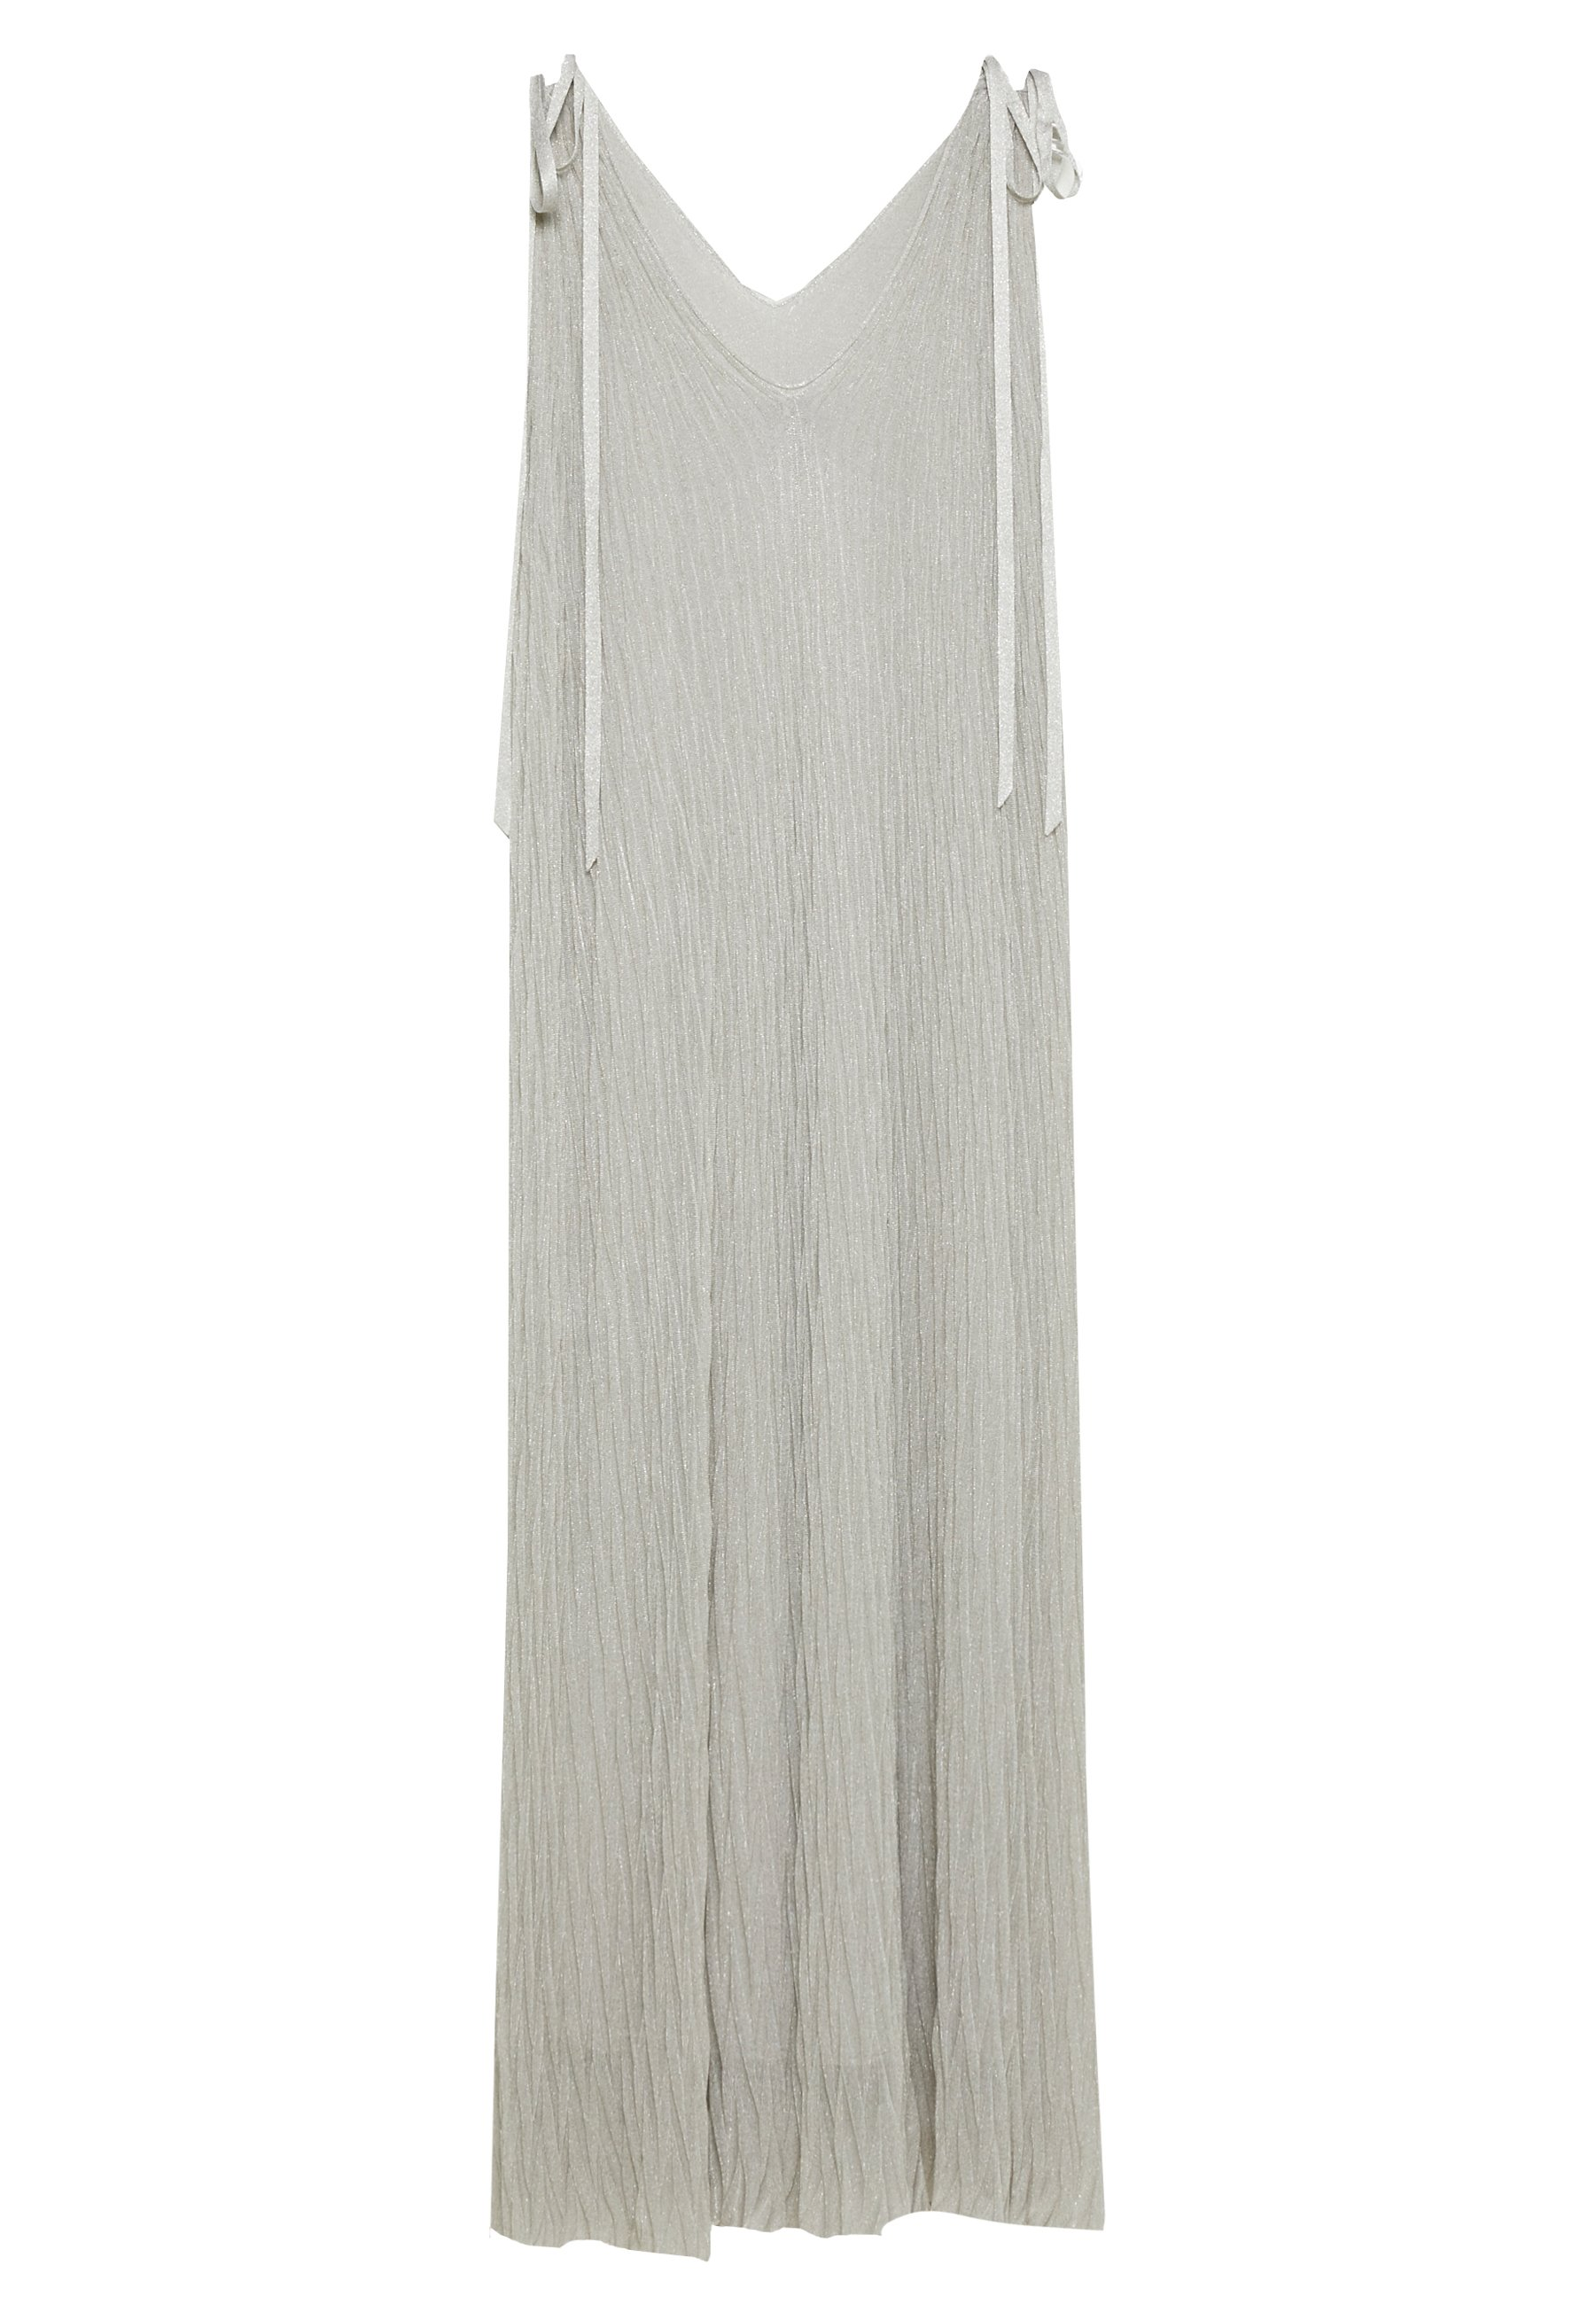 Mrz Dress - Maxi Silver UK